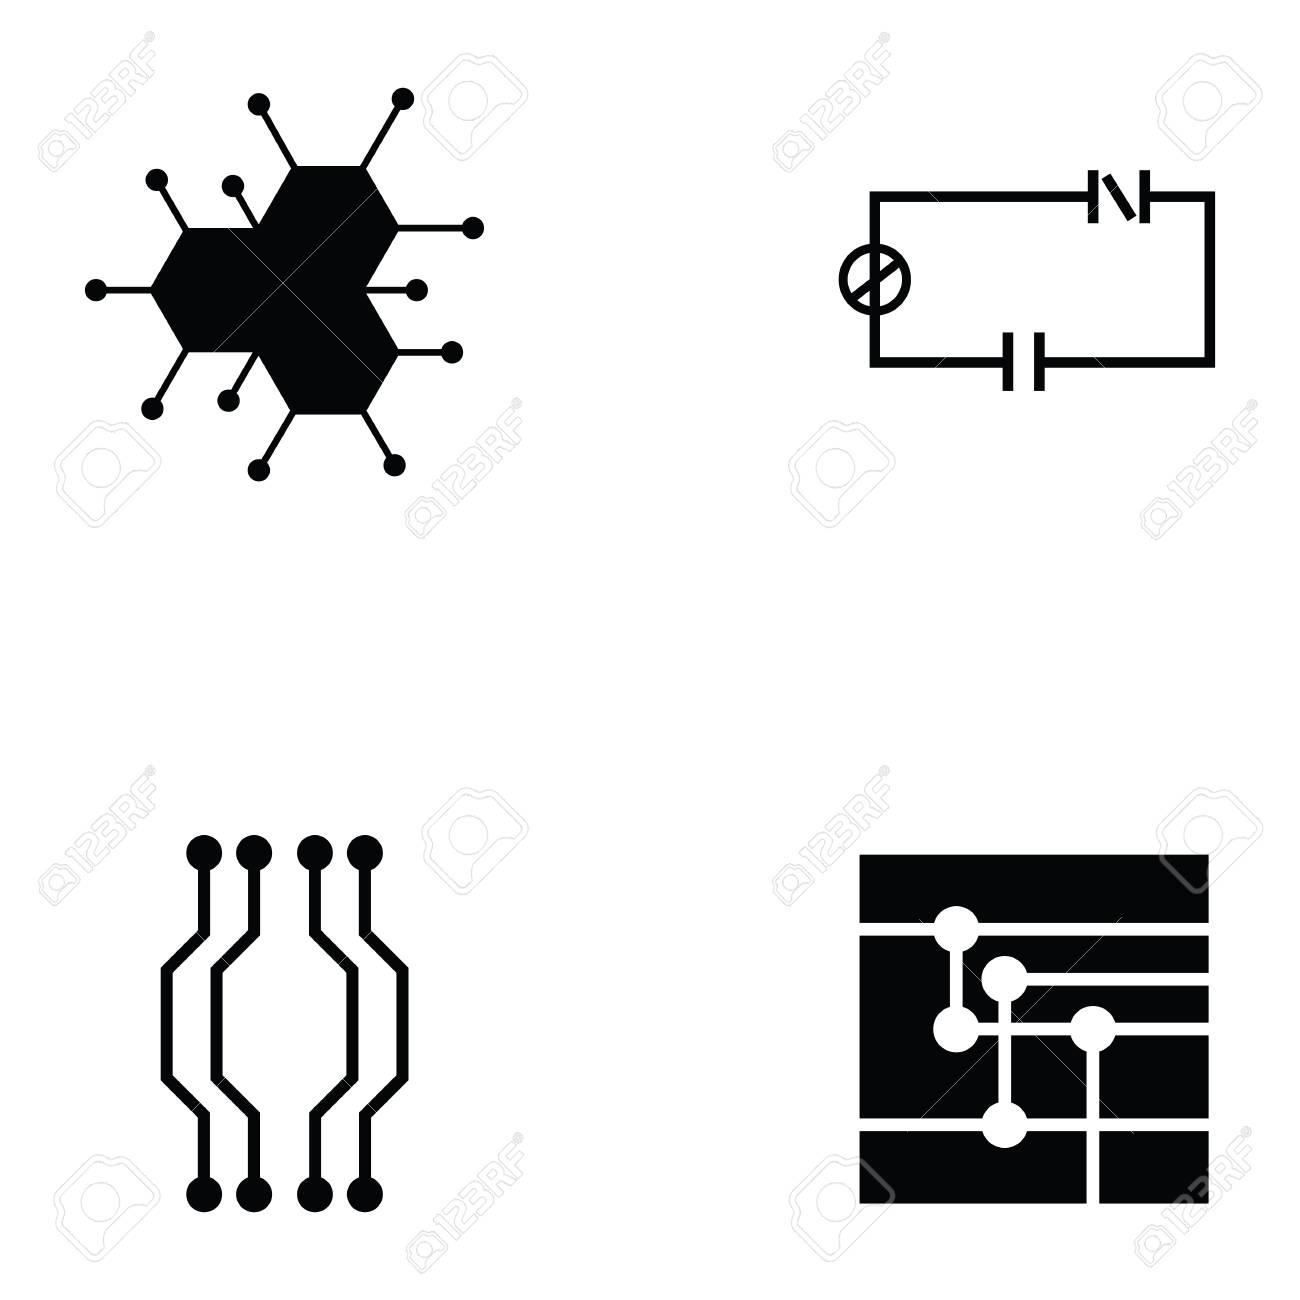 circuit board icon set royalty free cliparts vectors and stock rh 123rf com vector circuit board pattern free vector circuit board pattern free